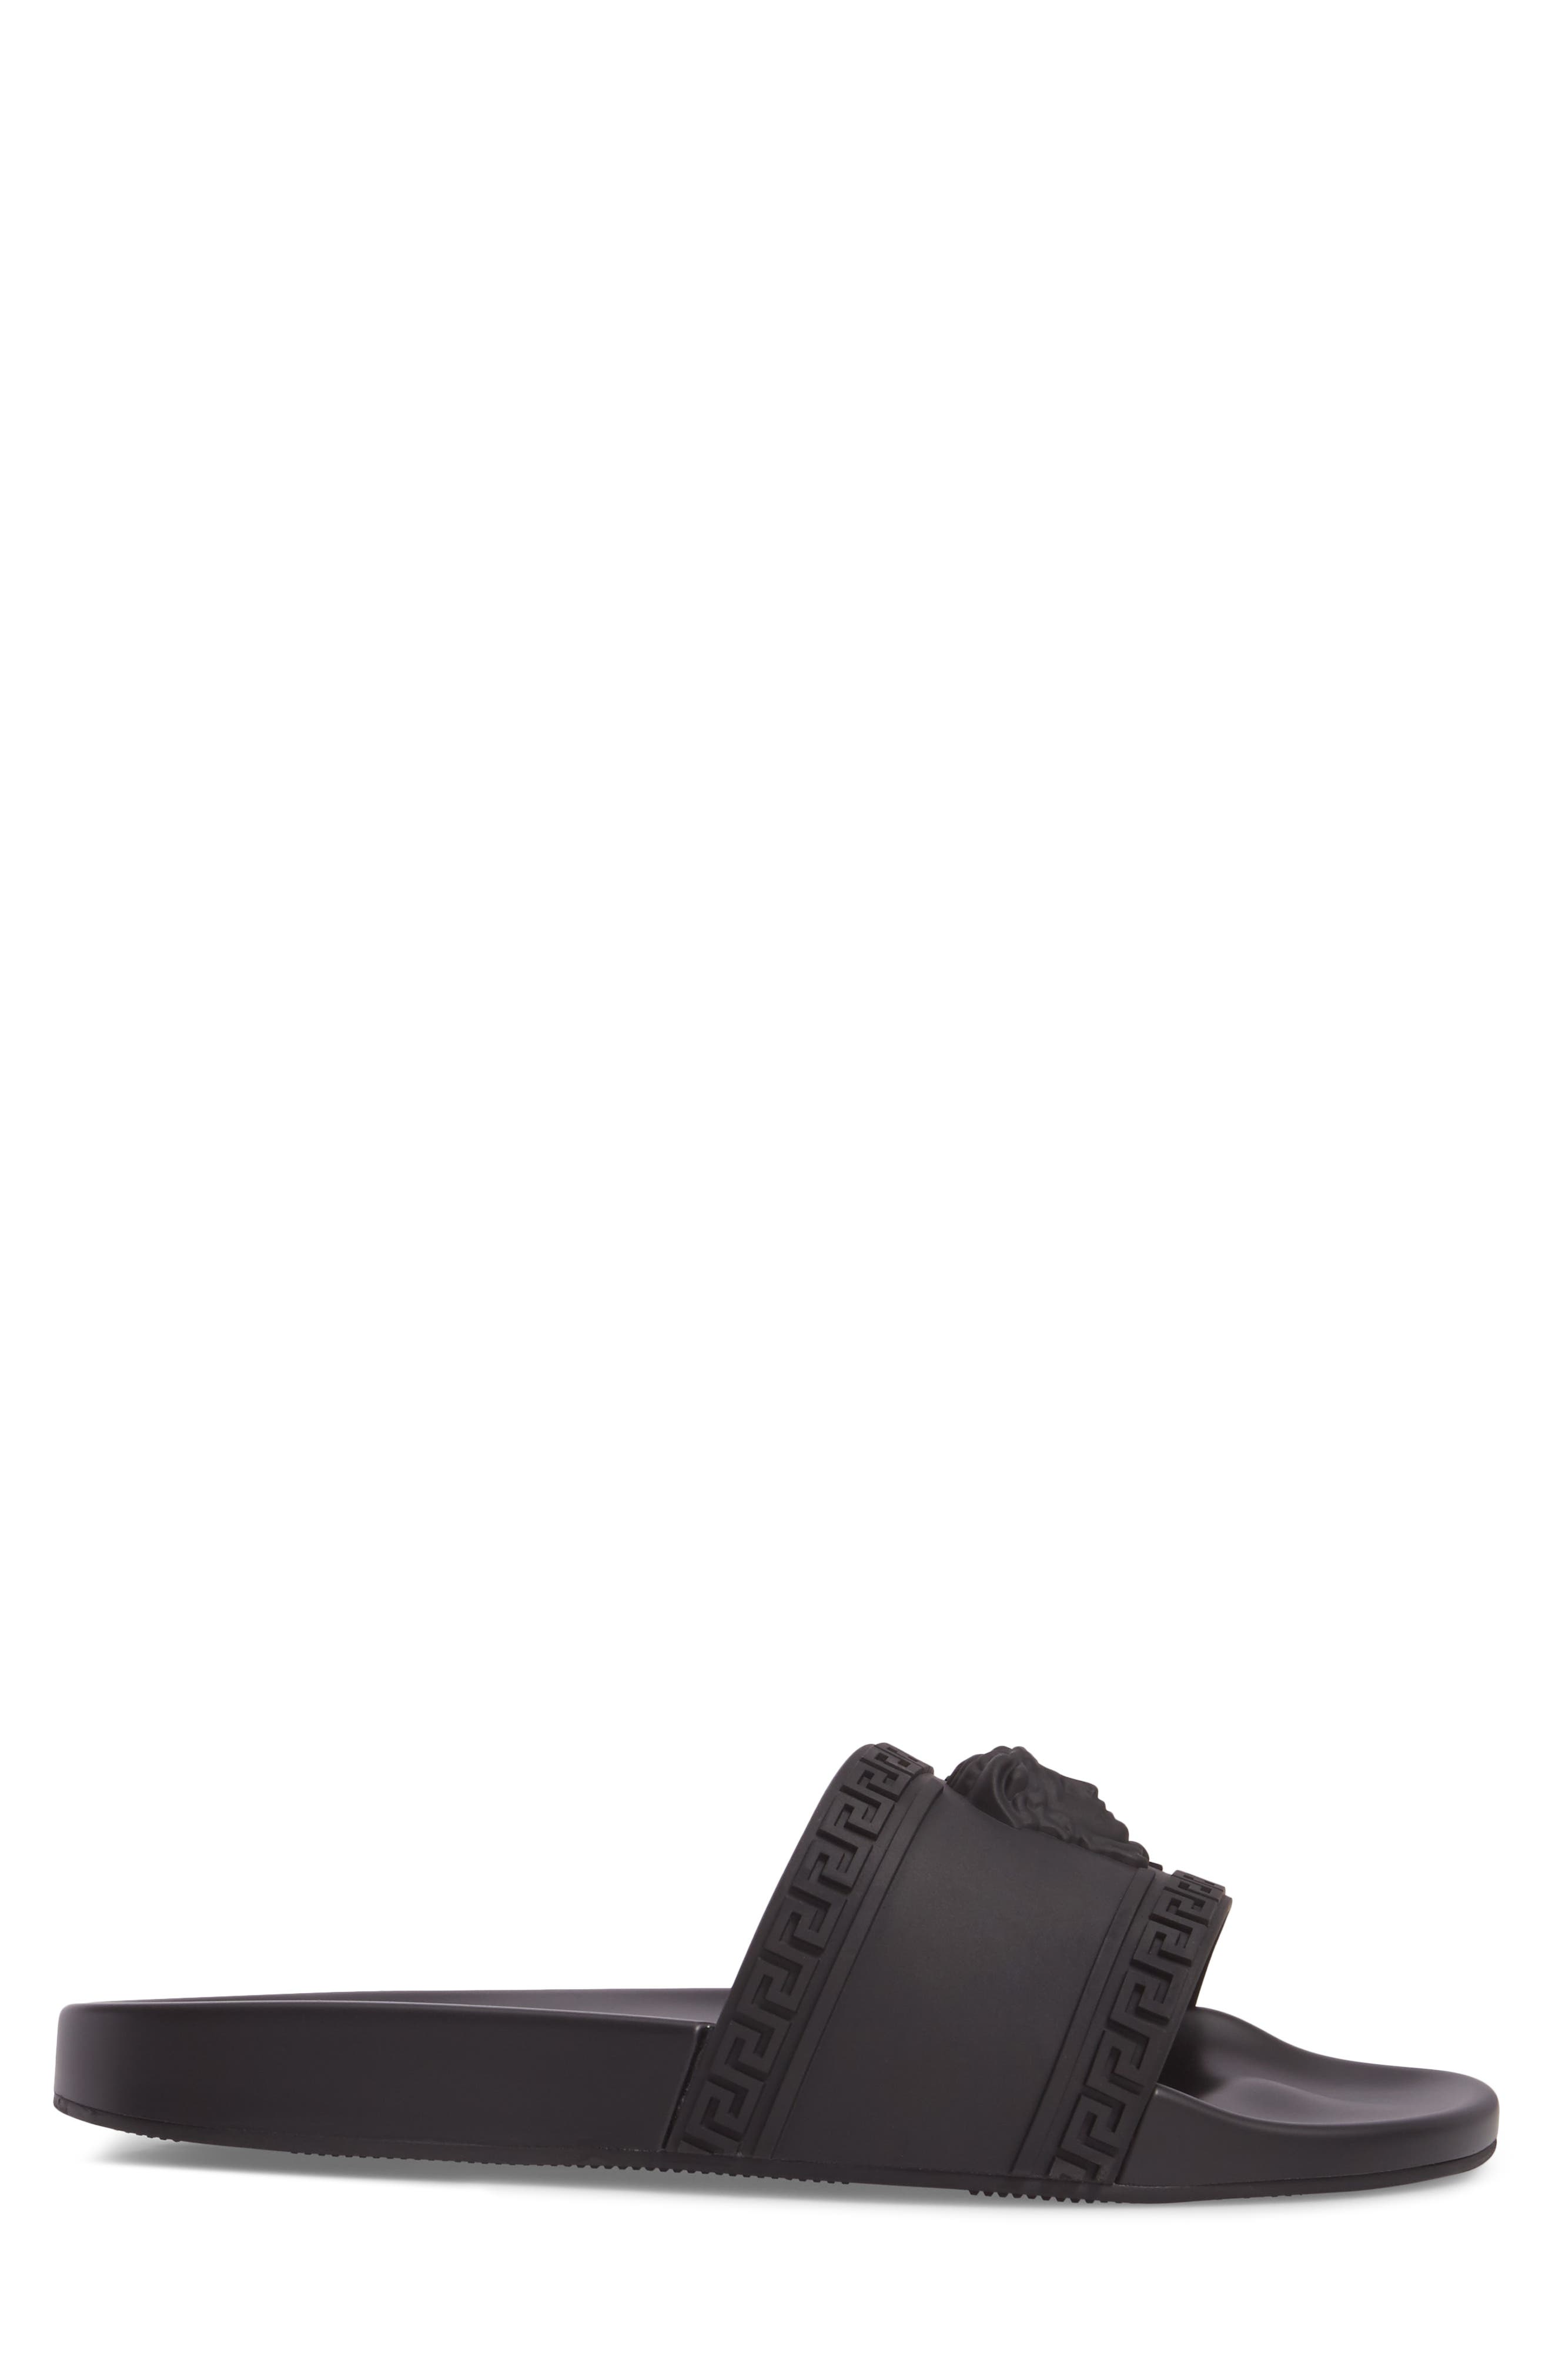 Palazzo Medusa Slide Sandal,                             Alternate thumbnail 3, color,                             Black